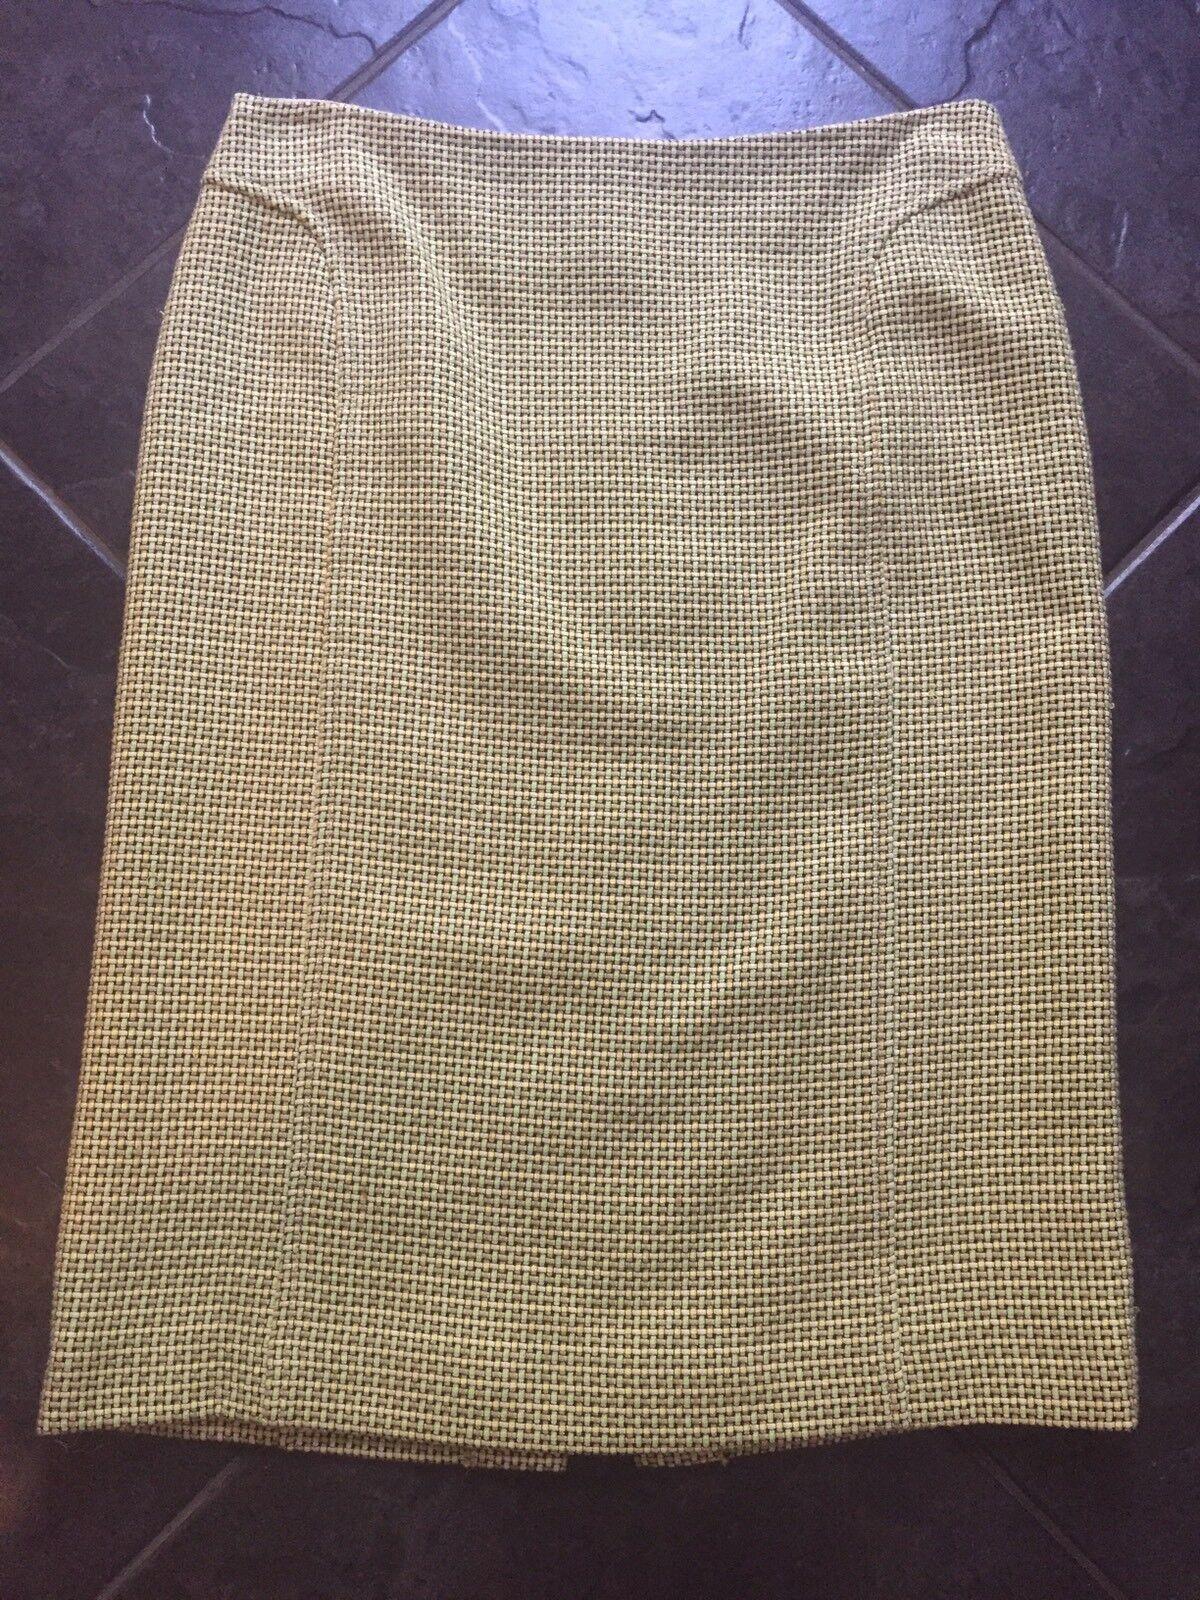 Mr & Mrs MacLeod Woven Cotton Pencil Skirt NWOT